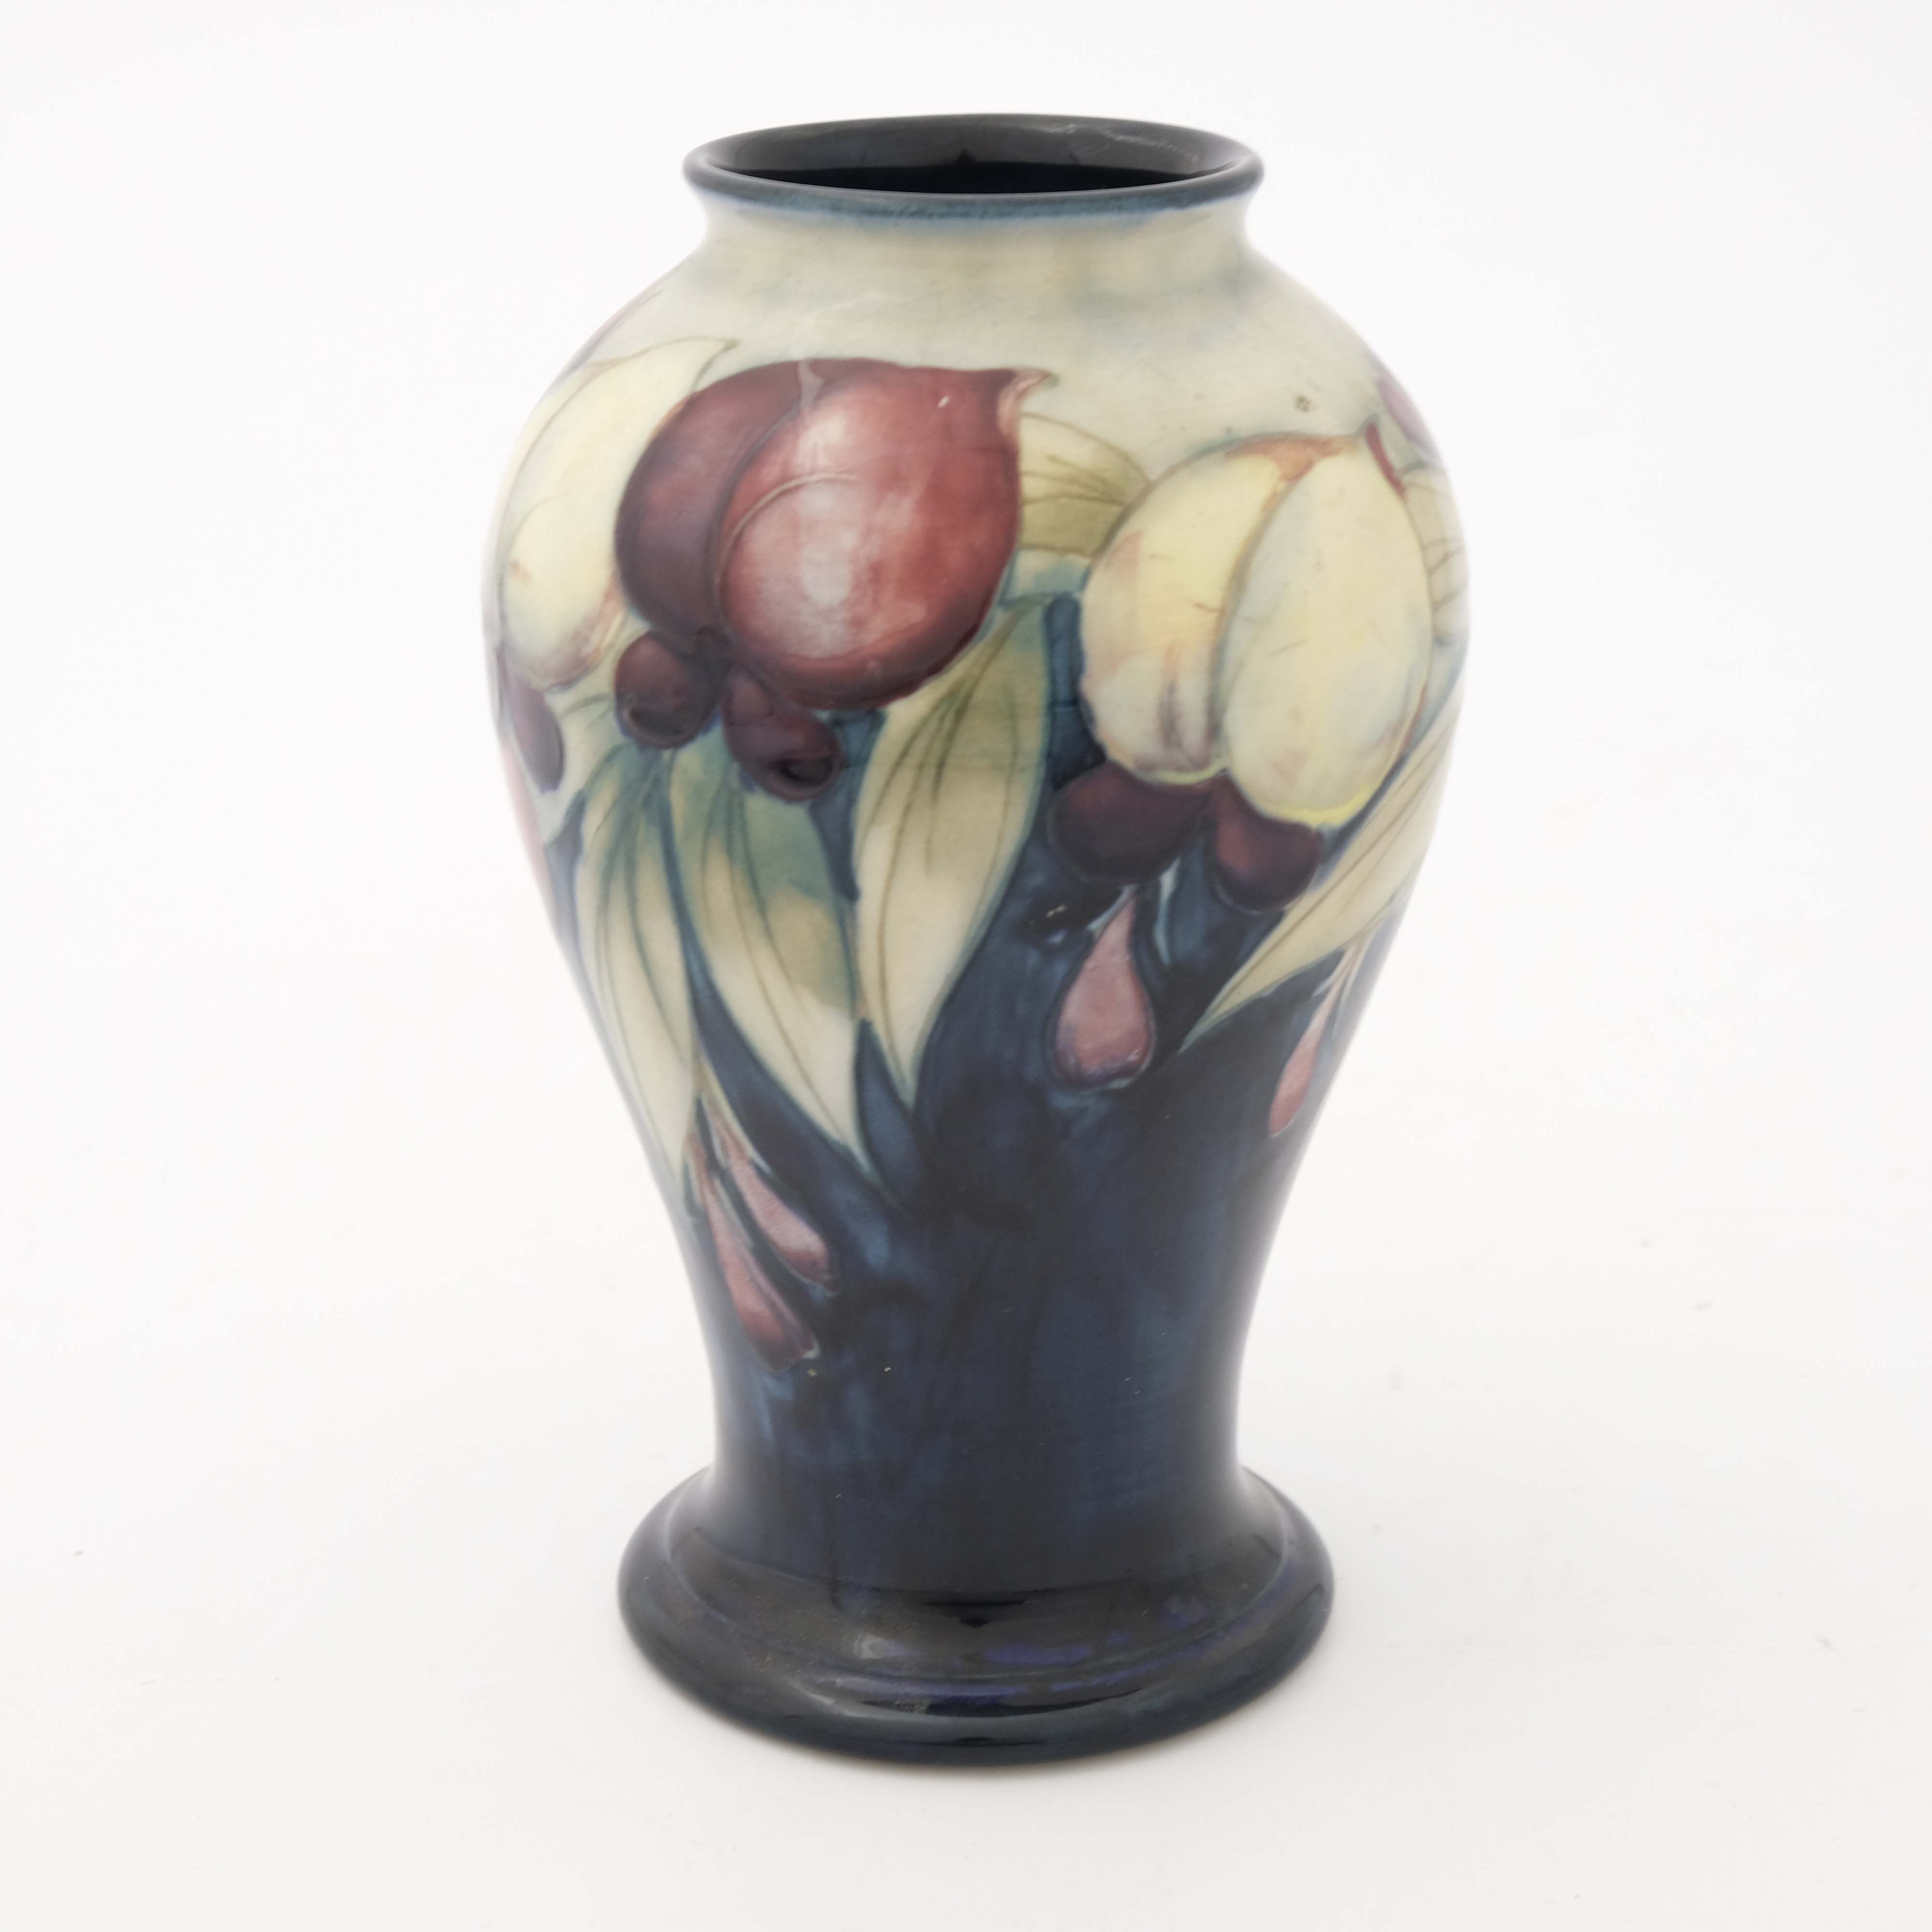 William Moorcroft, a Wisteria vase - Image 2 of 5